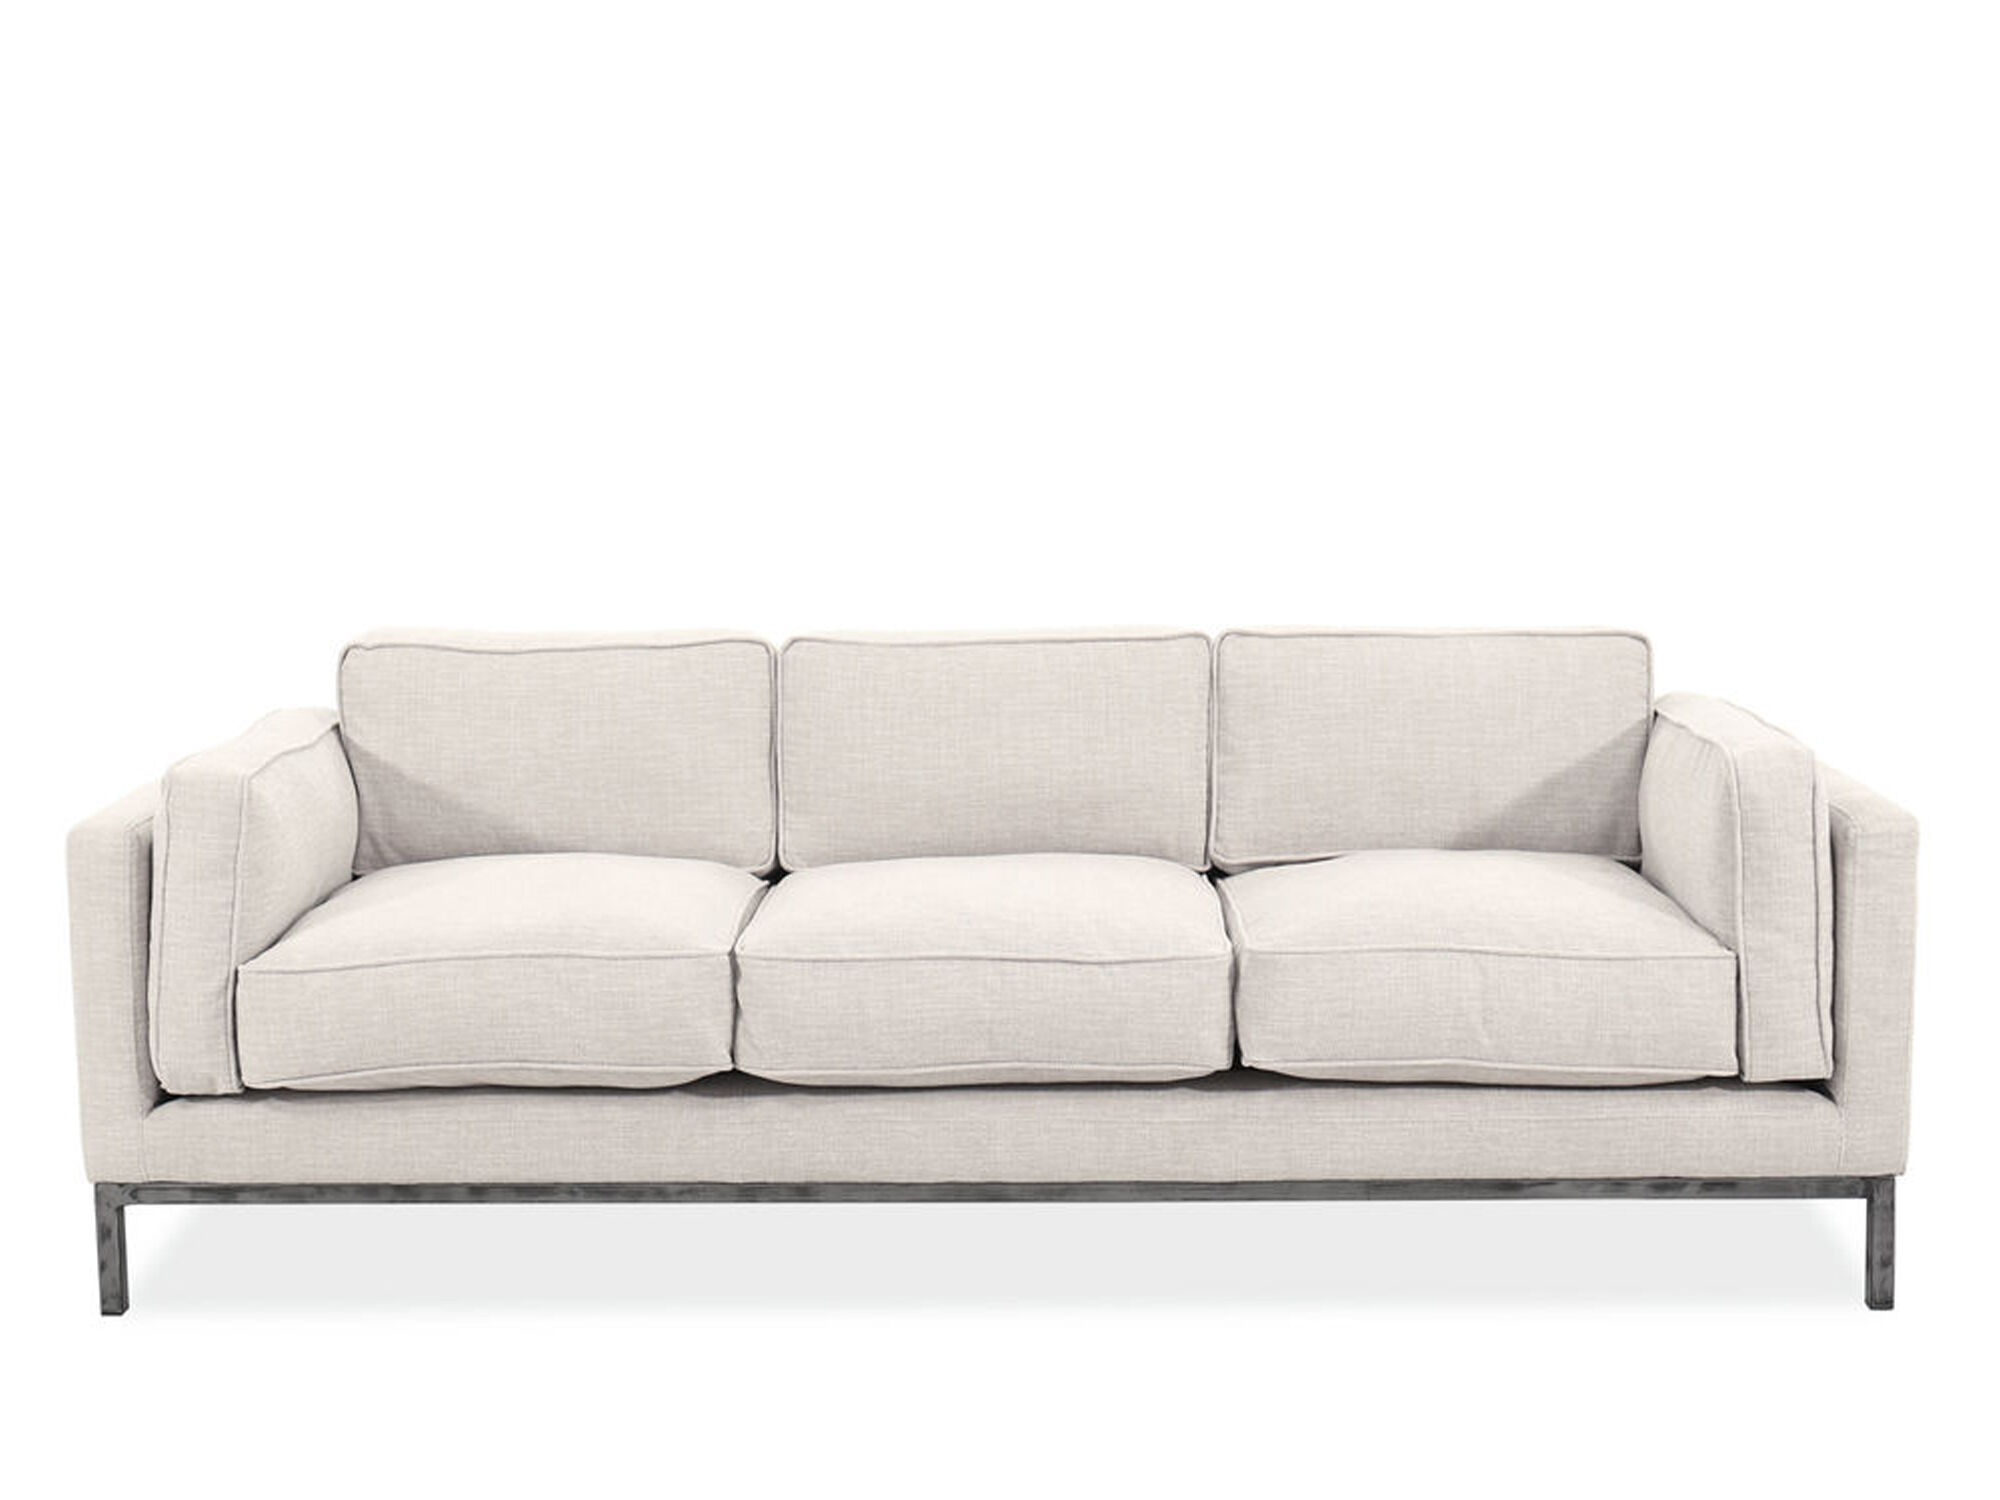 89u0026quot; Contemporary Low Profile Sofa ...